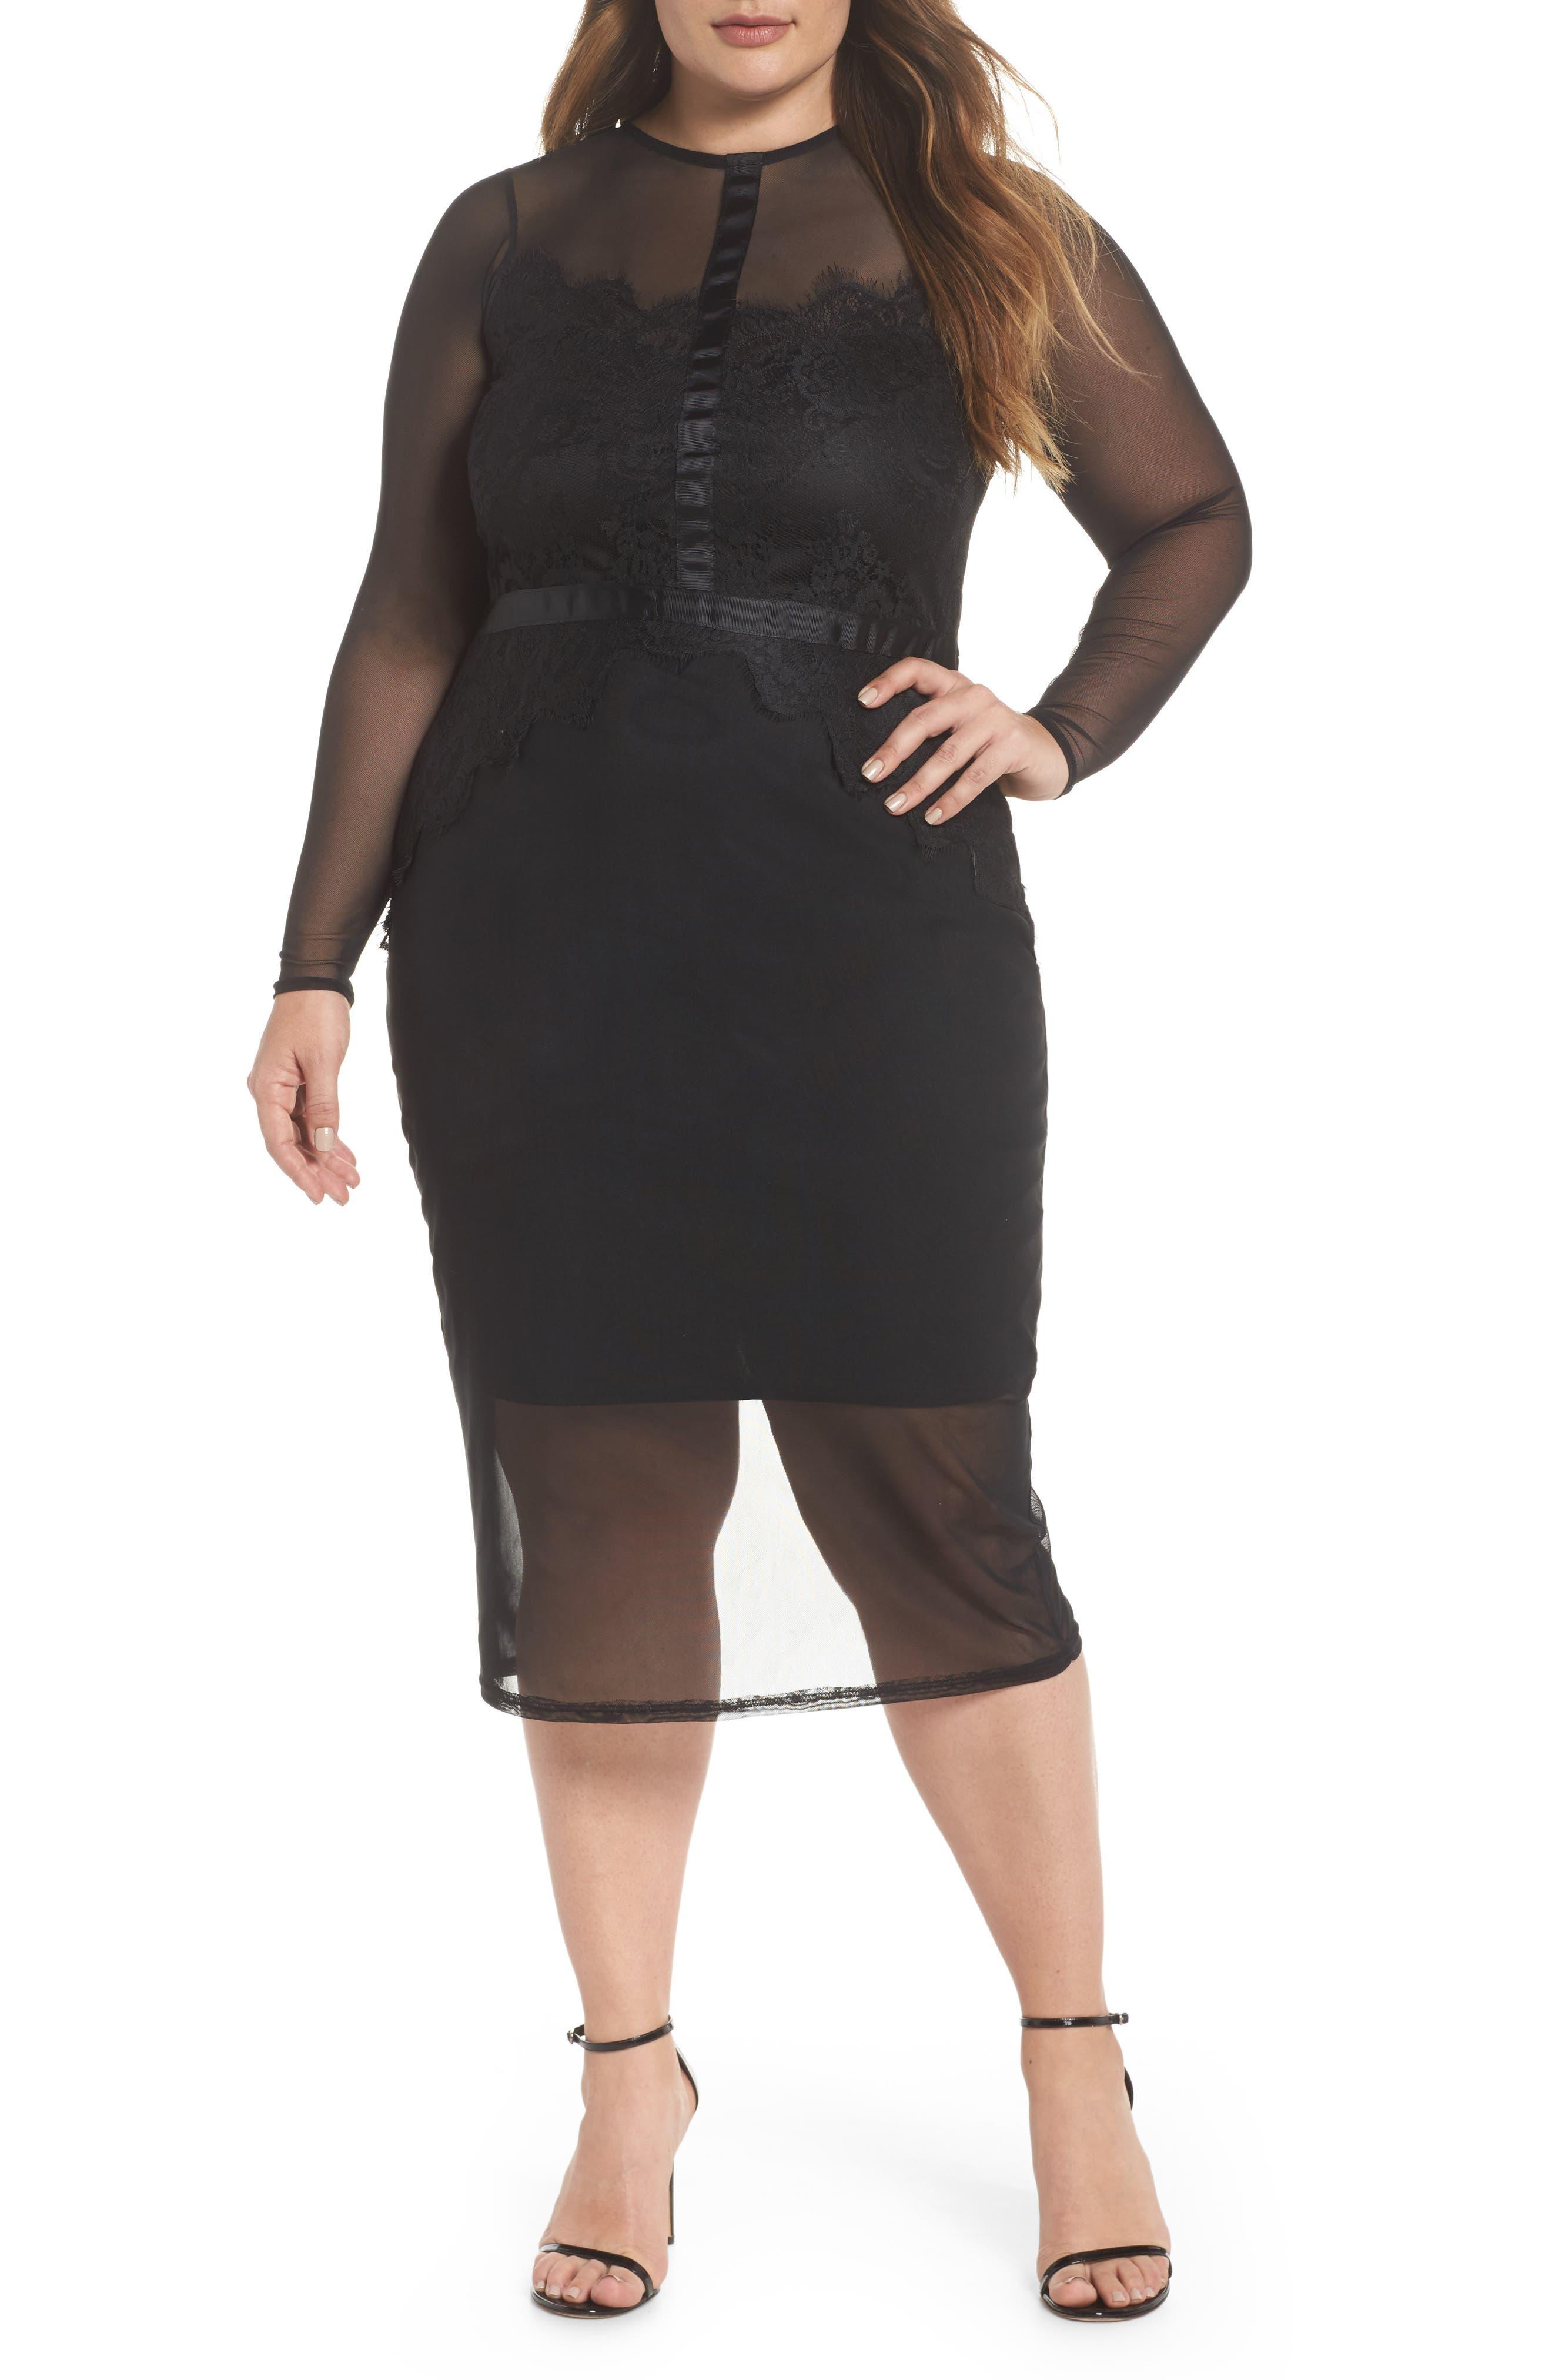 Body-Con Mesh Dress,                             Main thumbnail 1, color,                             Black